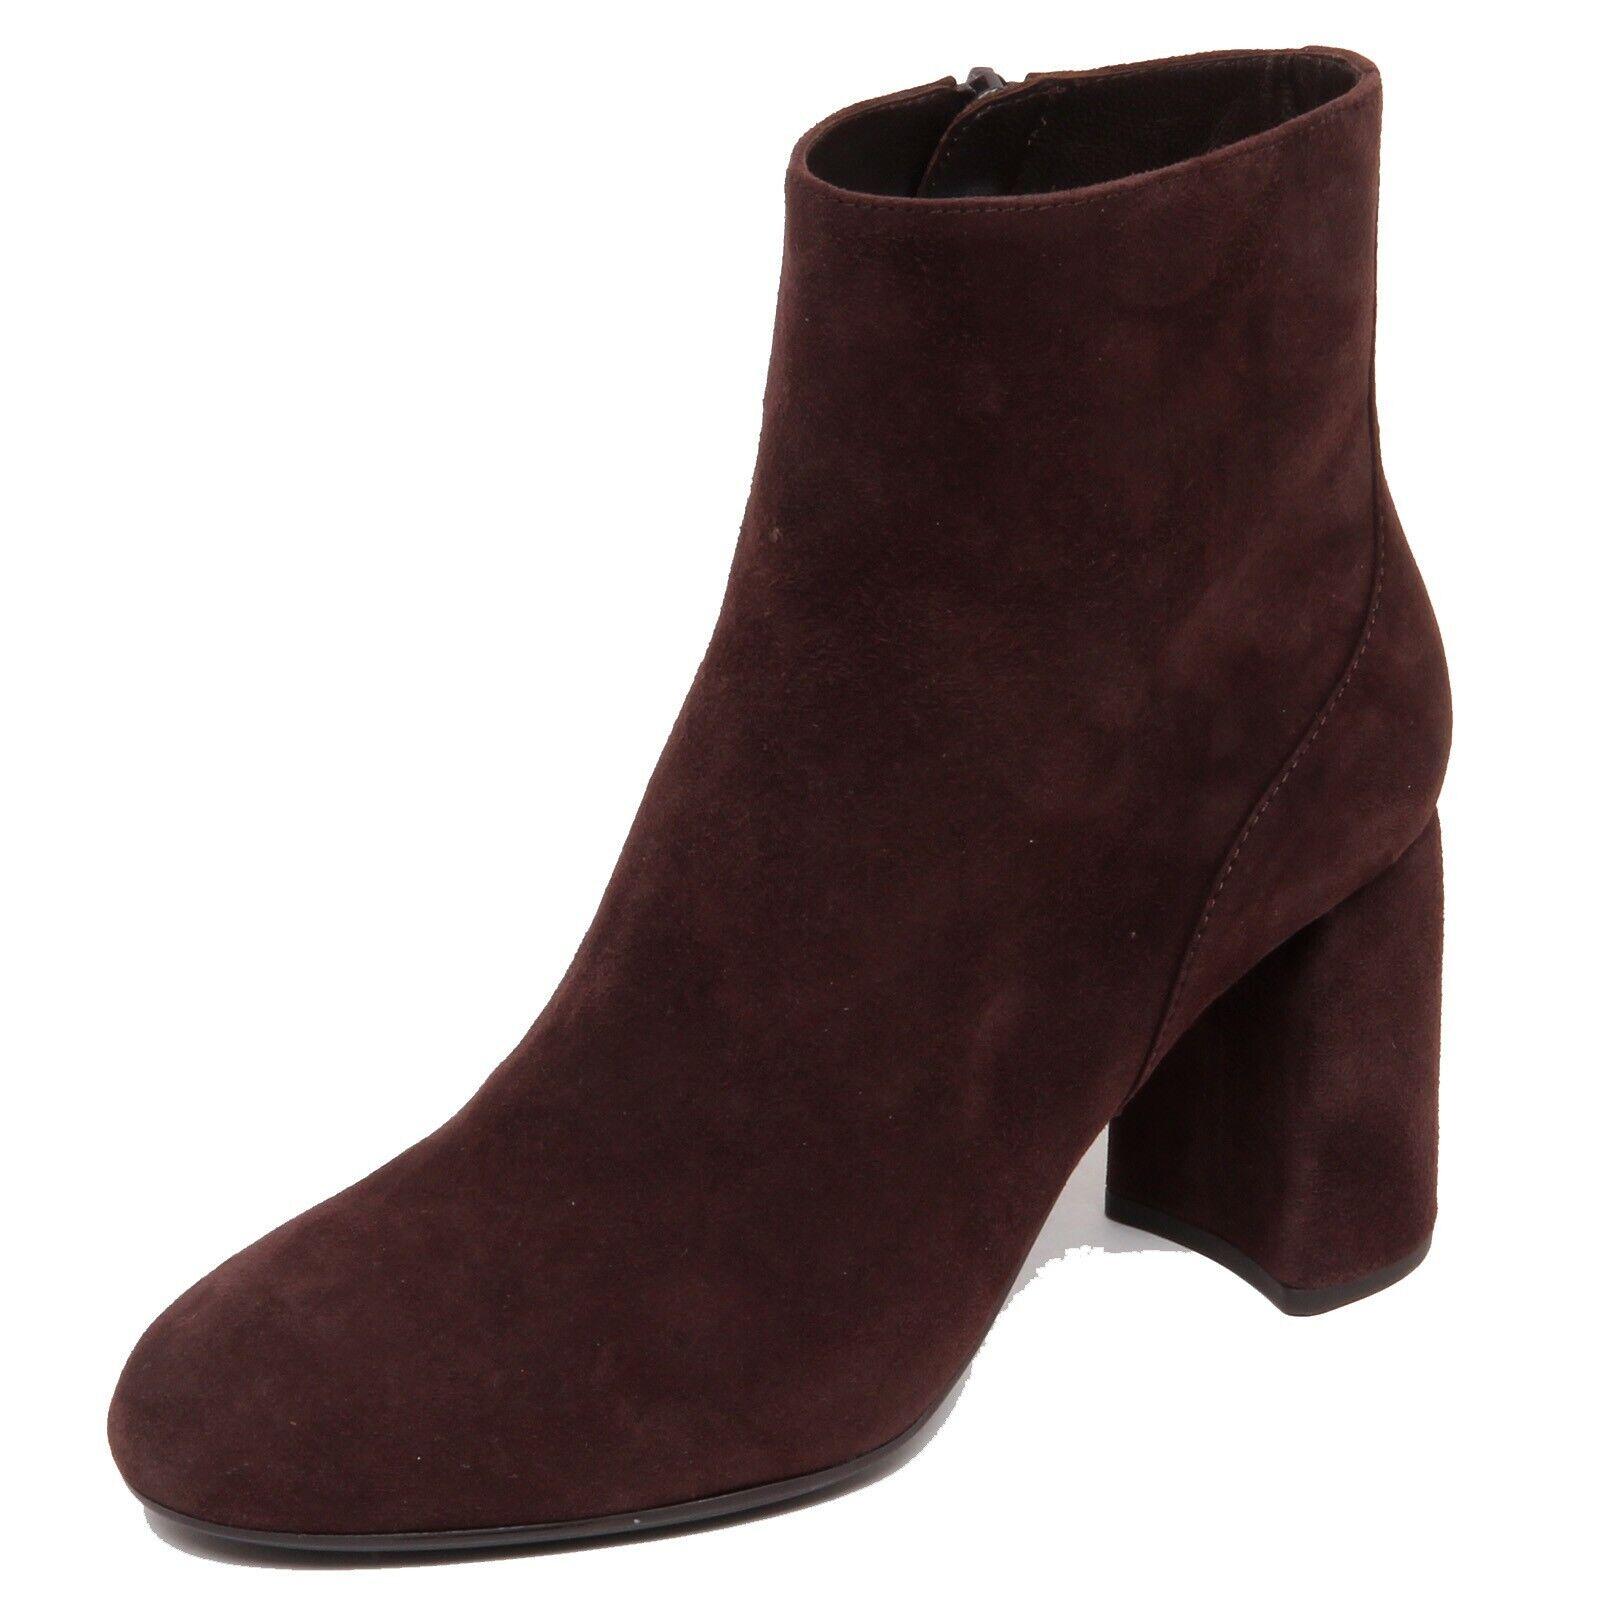 F6014 tronchetto mujer marrón UniSA odolfo zapatos bota zapatos Woman